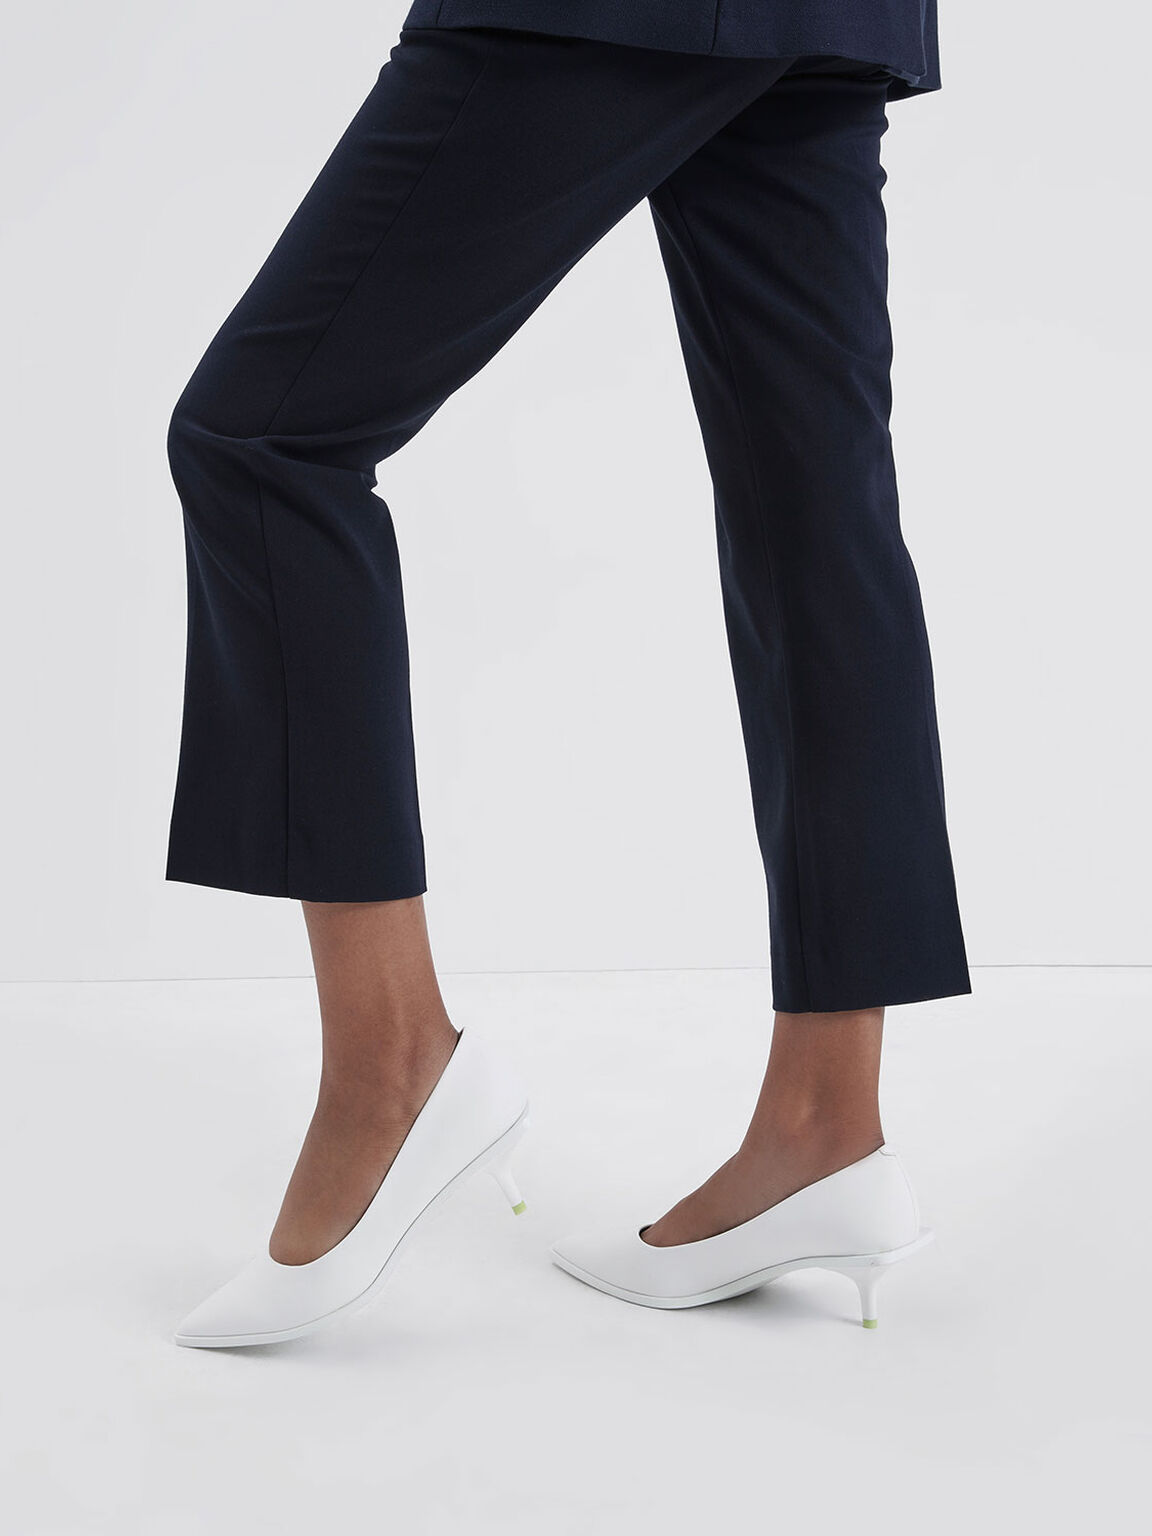 Pointed Toe Mini Heel Pumps, White, hi-res